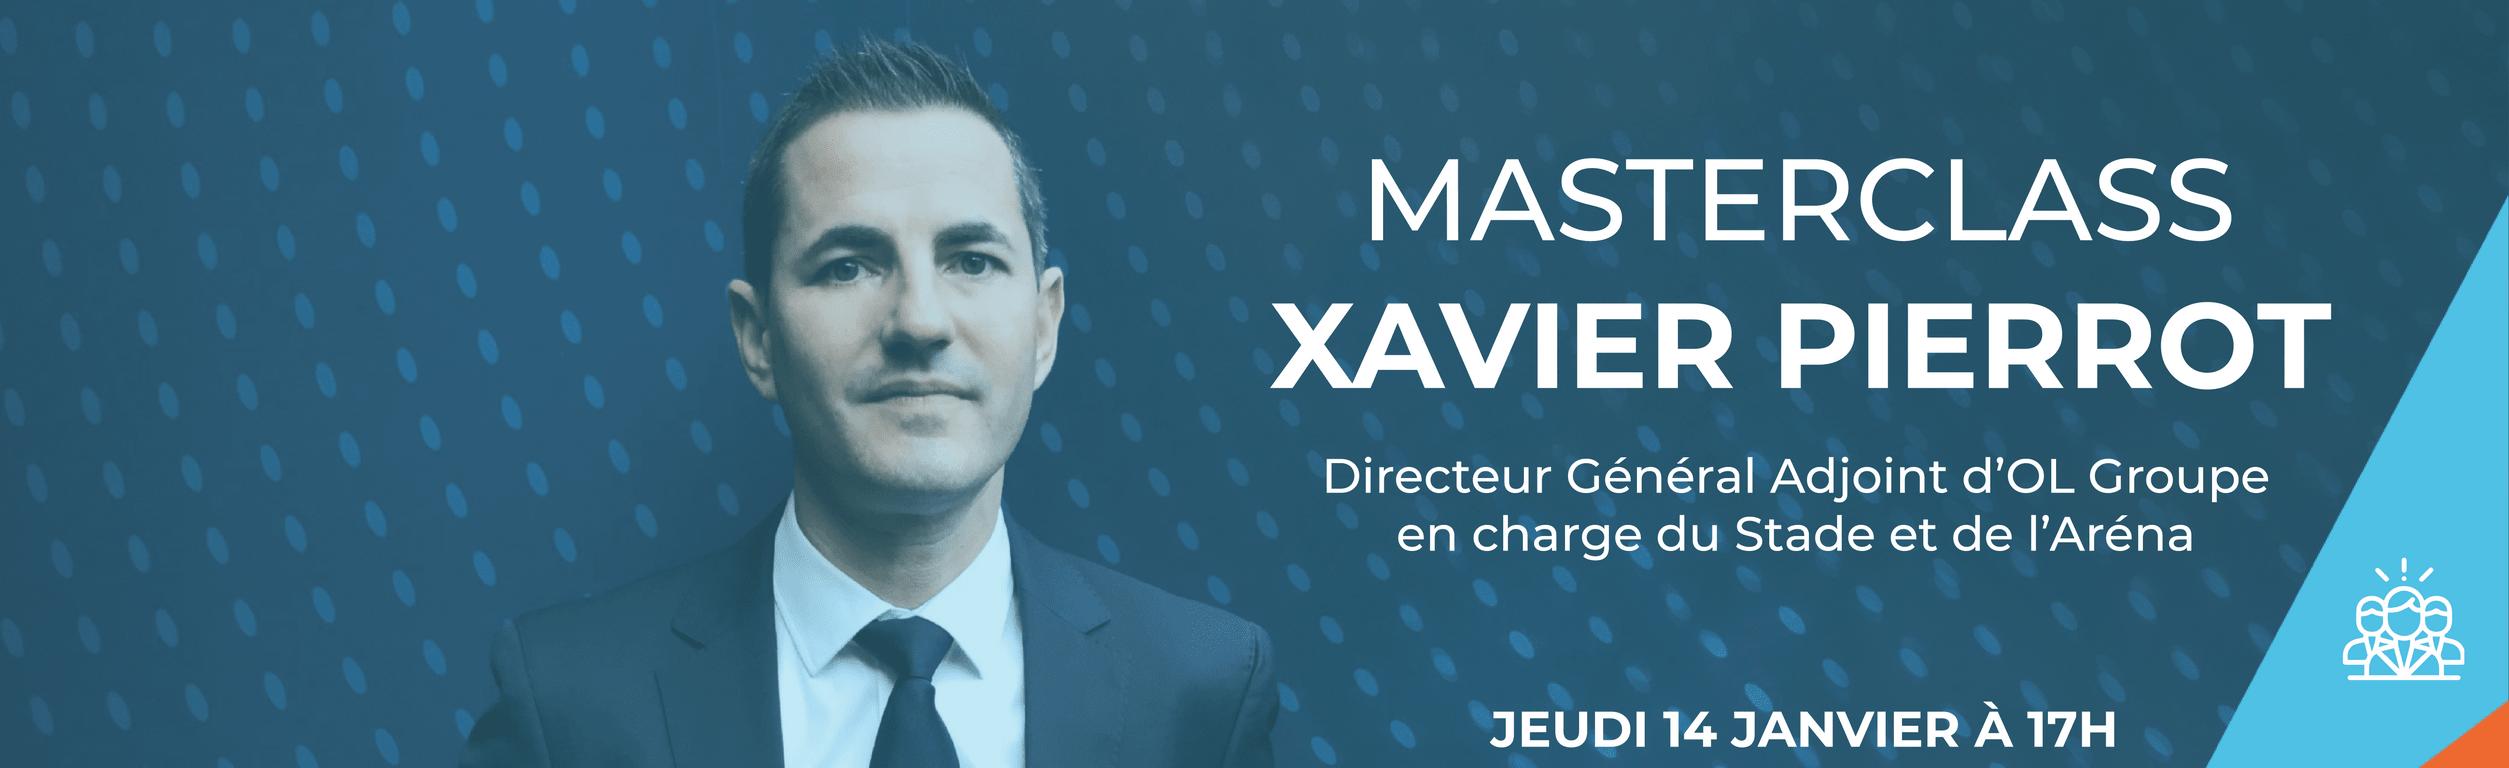 Masterclass Xavier Pierrot